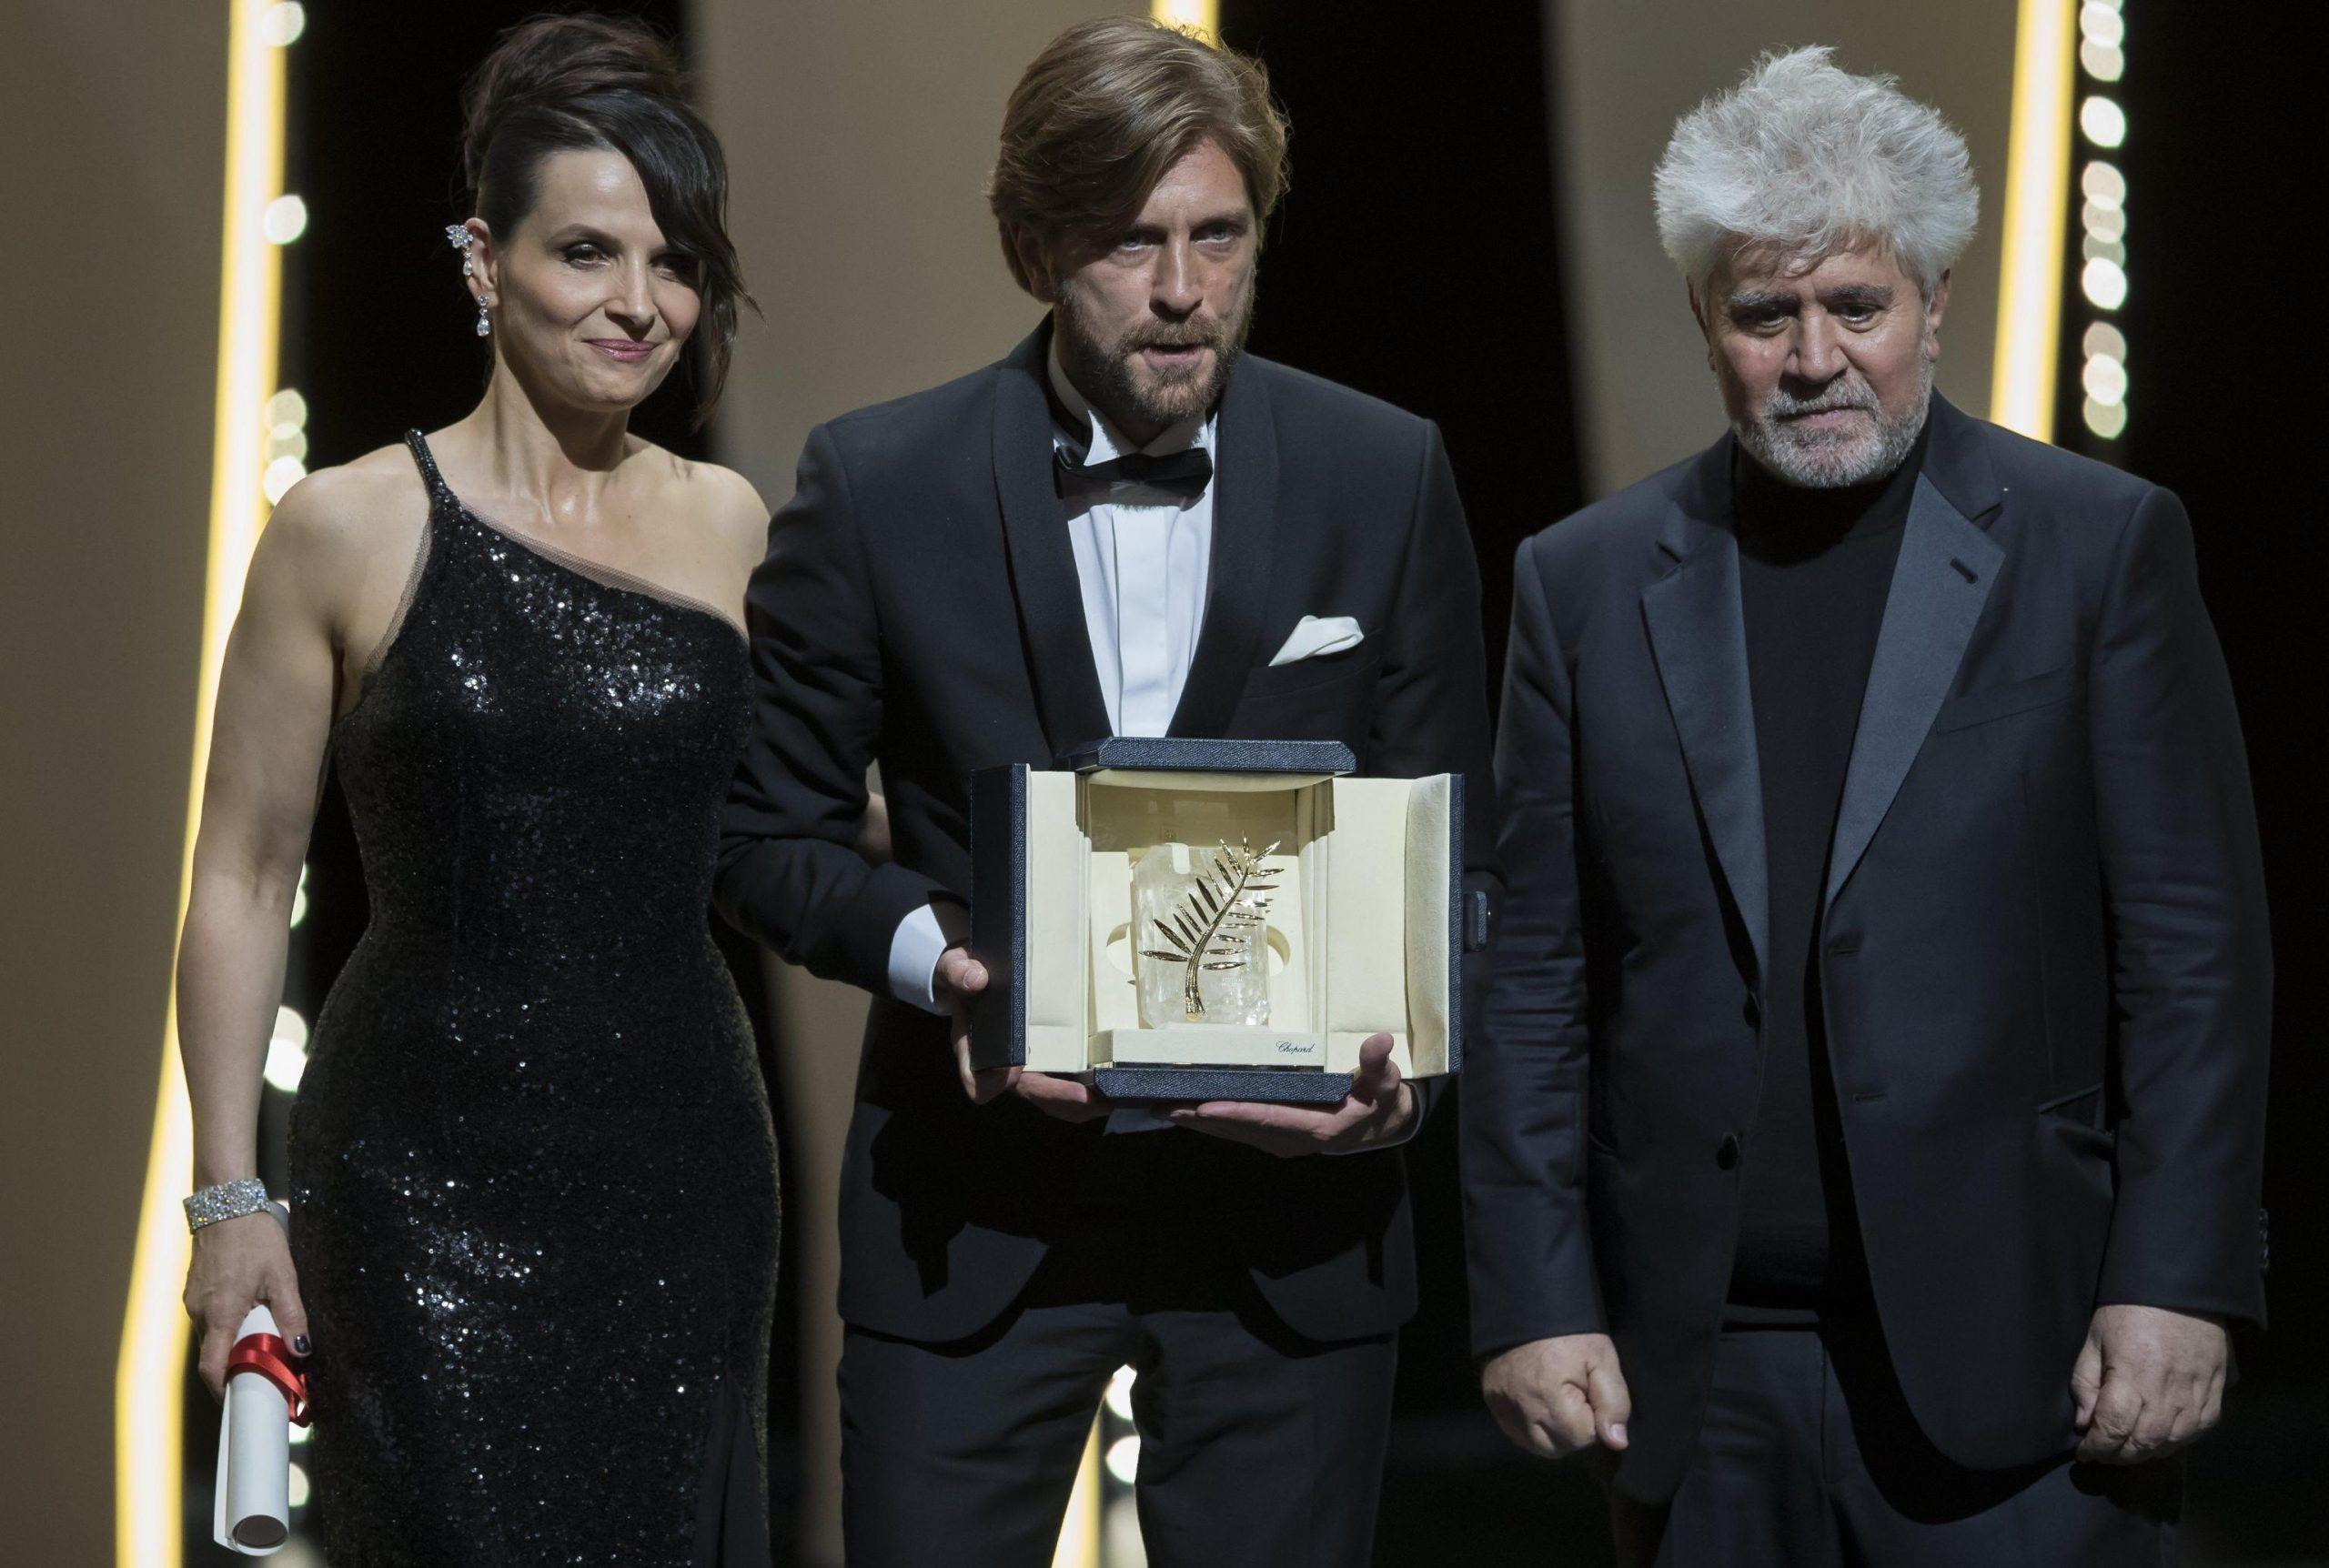 Cannes 2017, vincitori: Palma d'oro a The Square di Ruben Ostlund